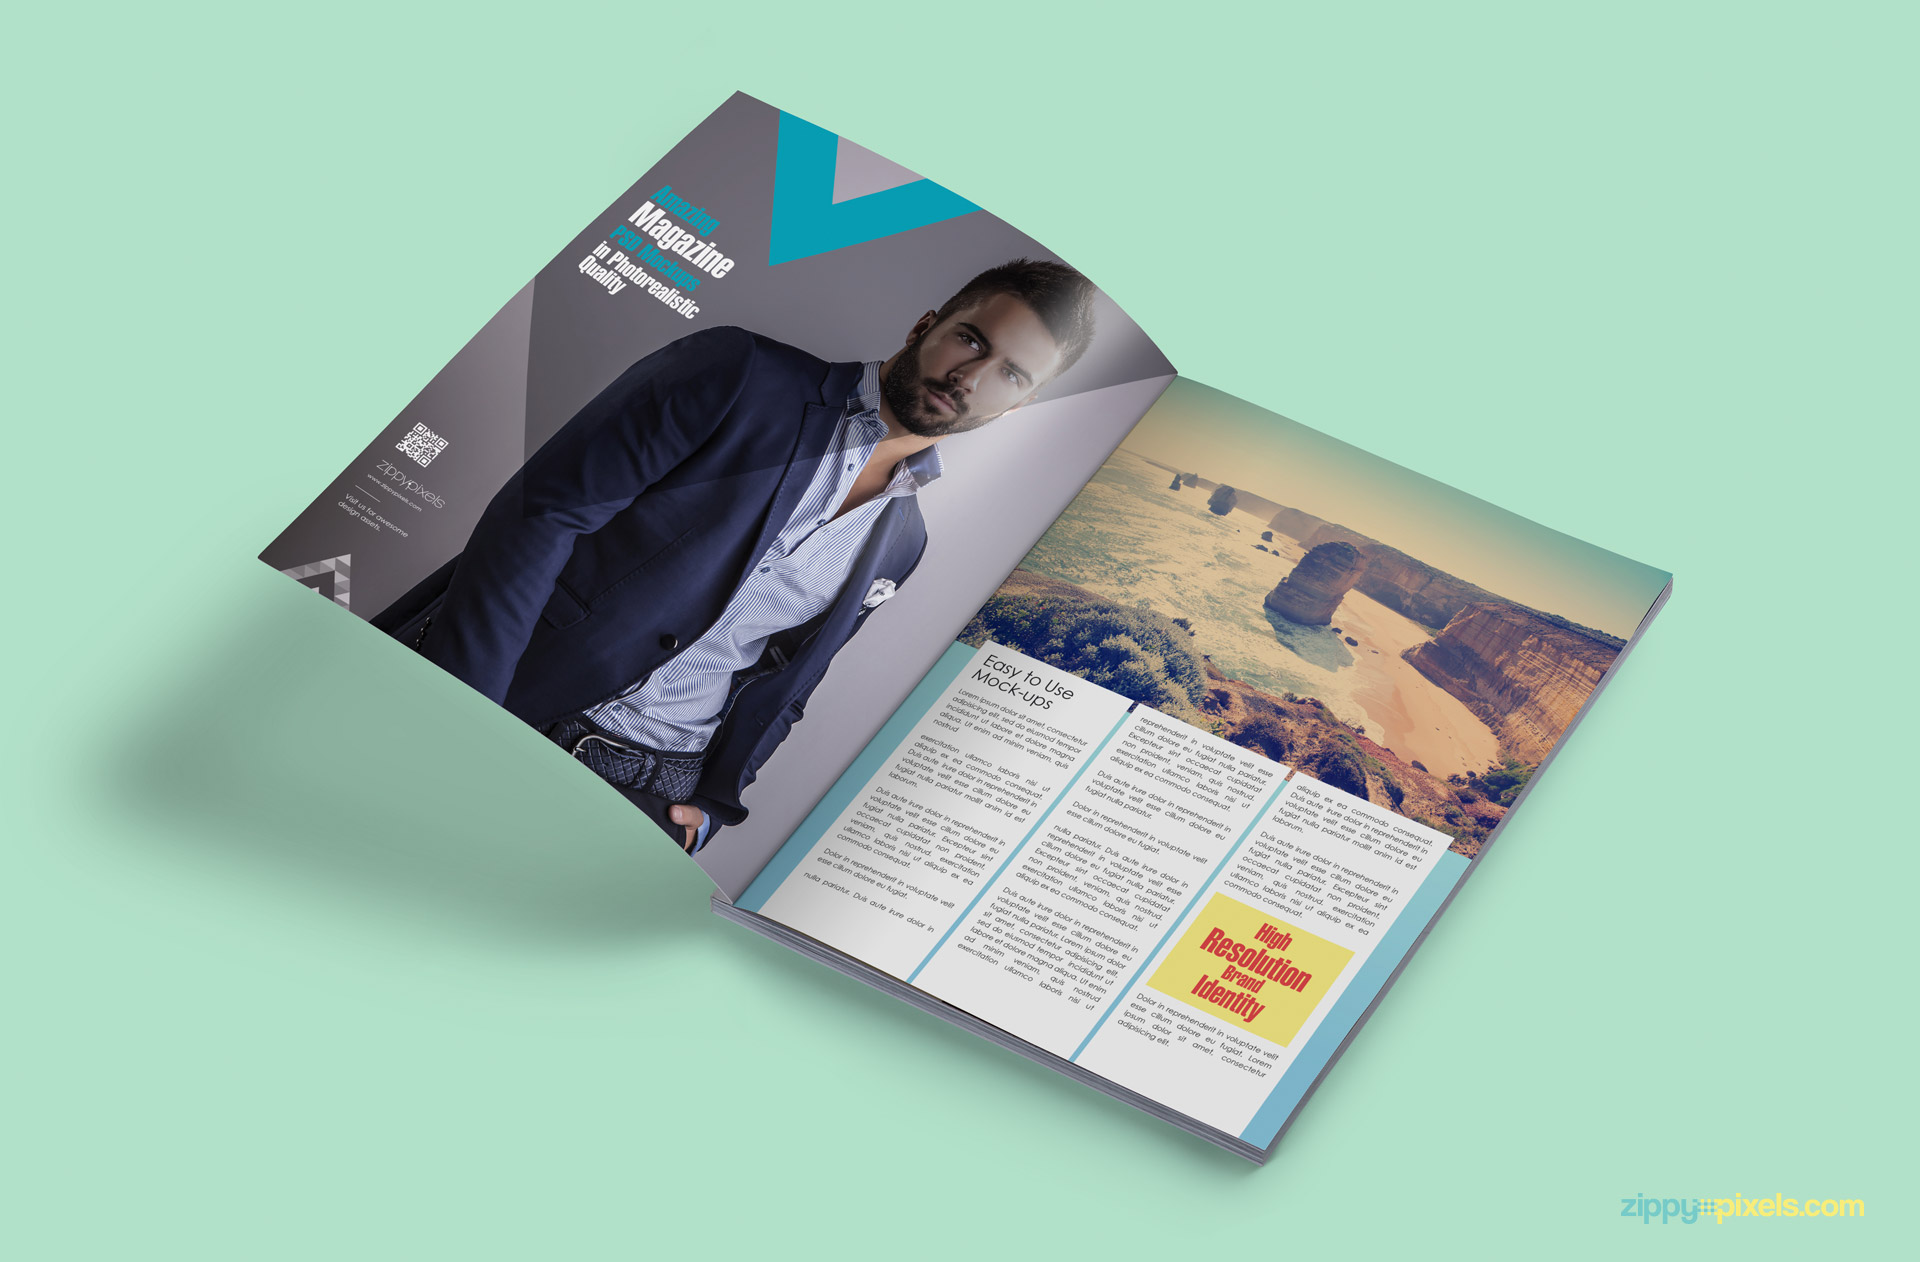 magazine-mockup-1920x1262px-2